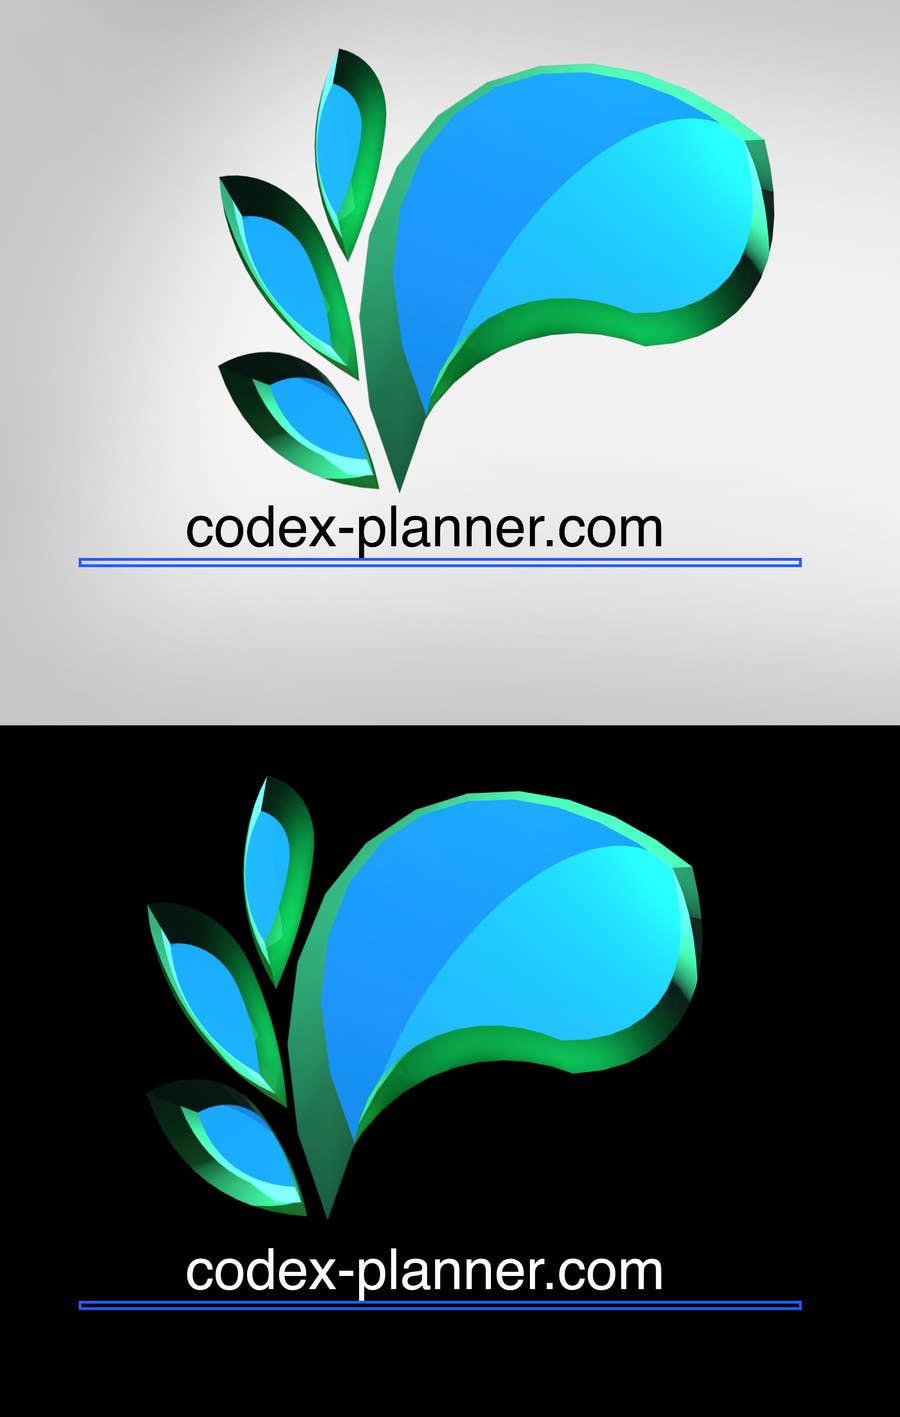 Penyertaan Peraduan #14 untuk Design a Logo for Project Management Site